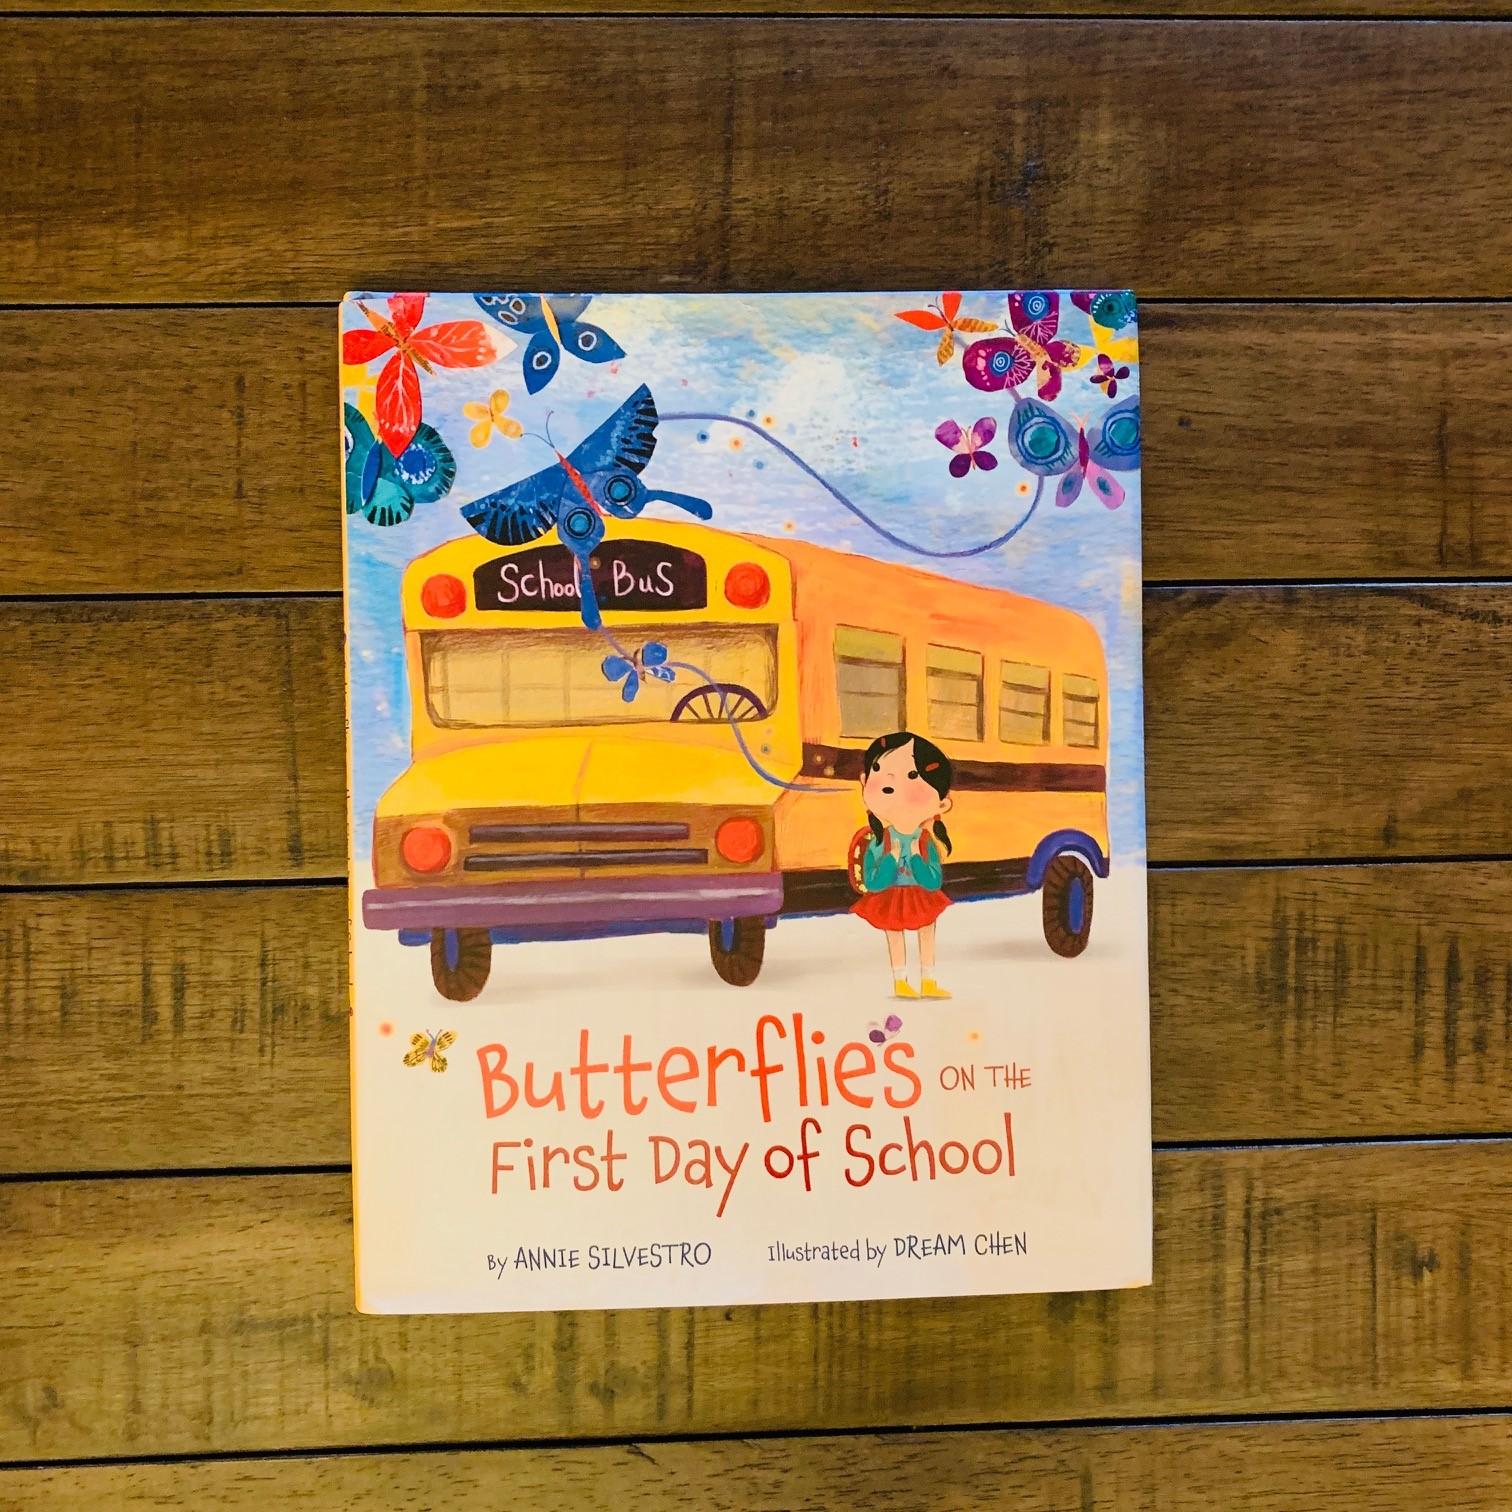 ButterfliesOnTheFirstDayofSchool_foreshadowboxerDOTcom.jpg